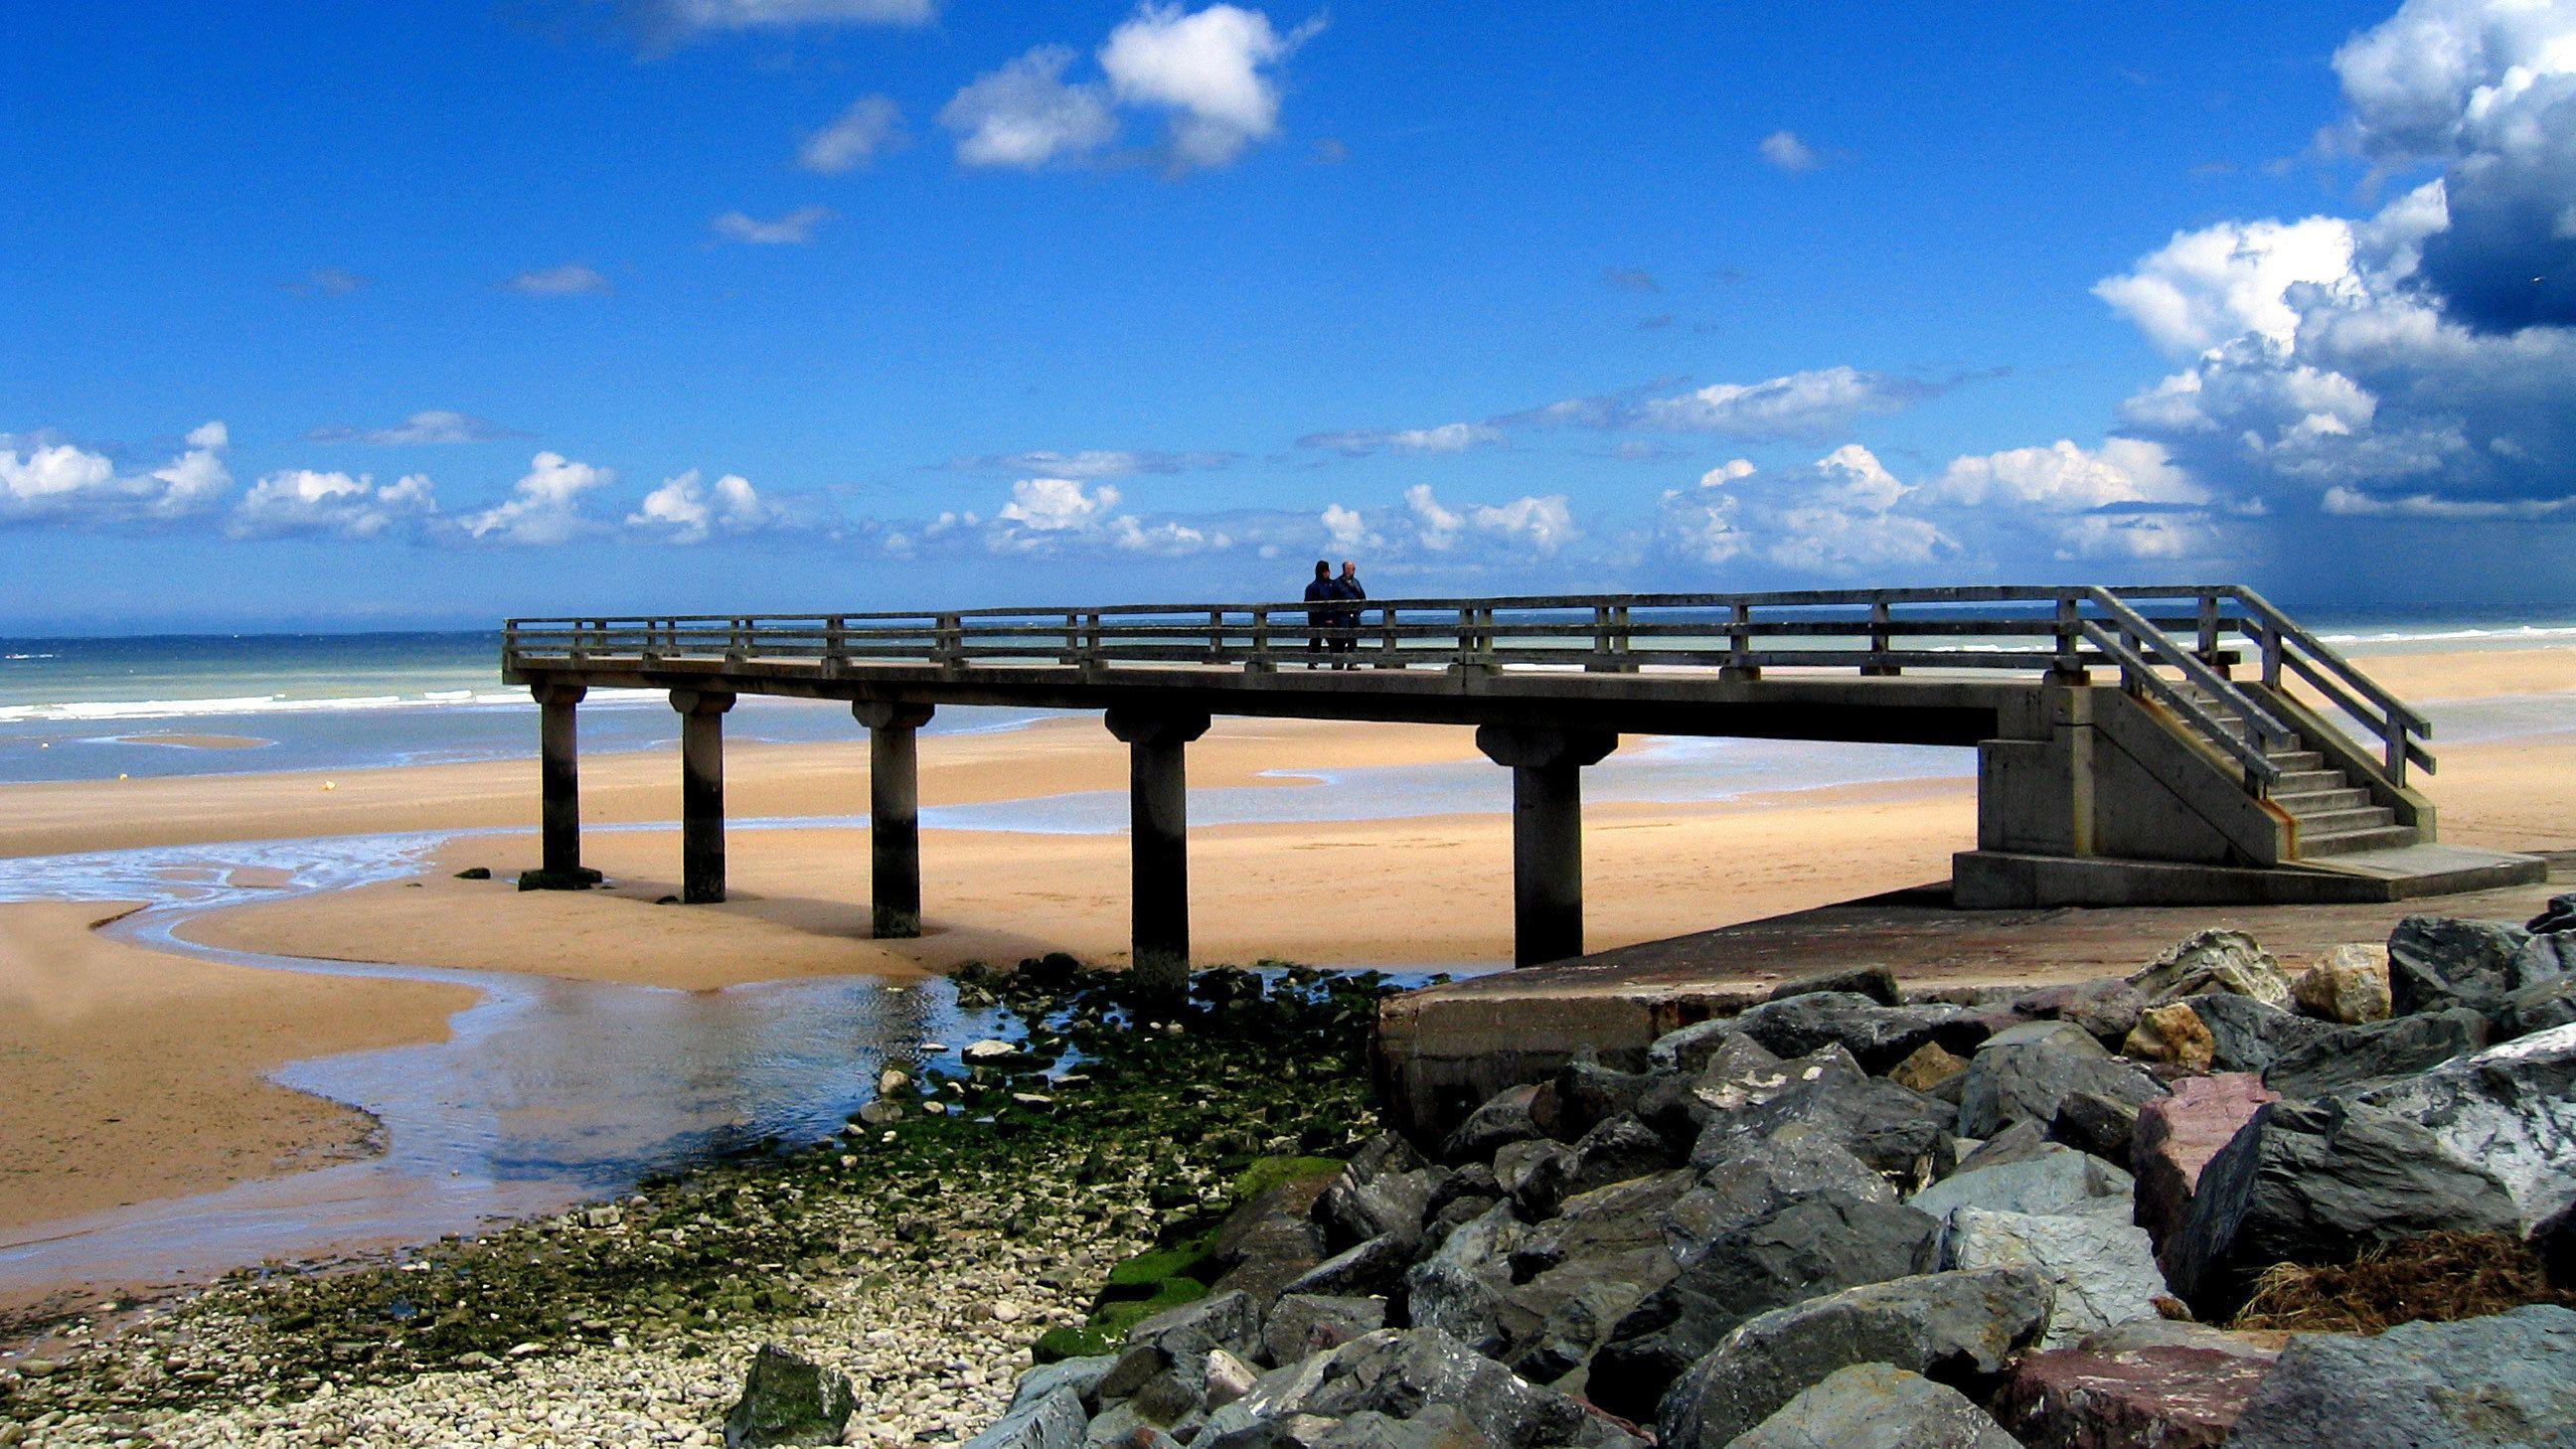 boardwalk at ocean beach